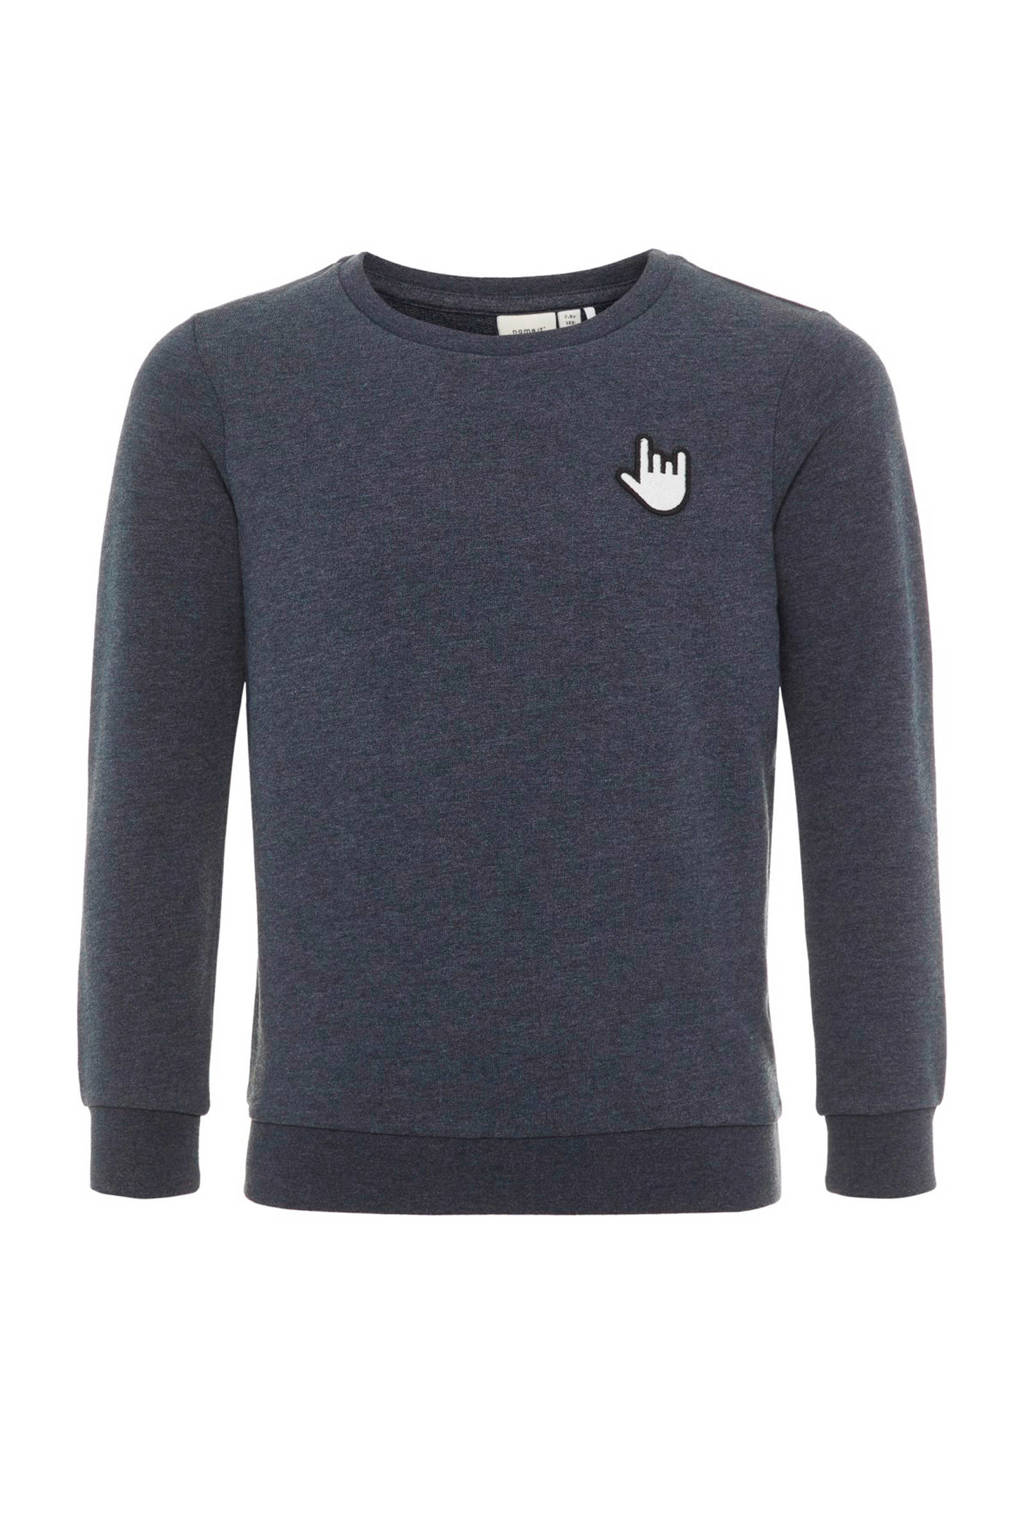 NAME IT sweater Berbel donkerblauw, Donkerblauw